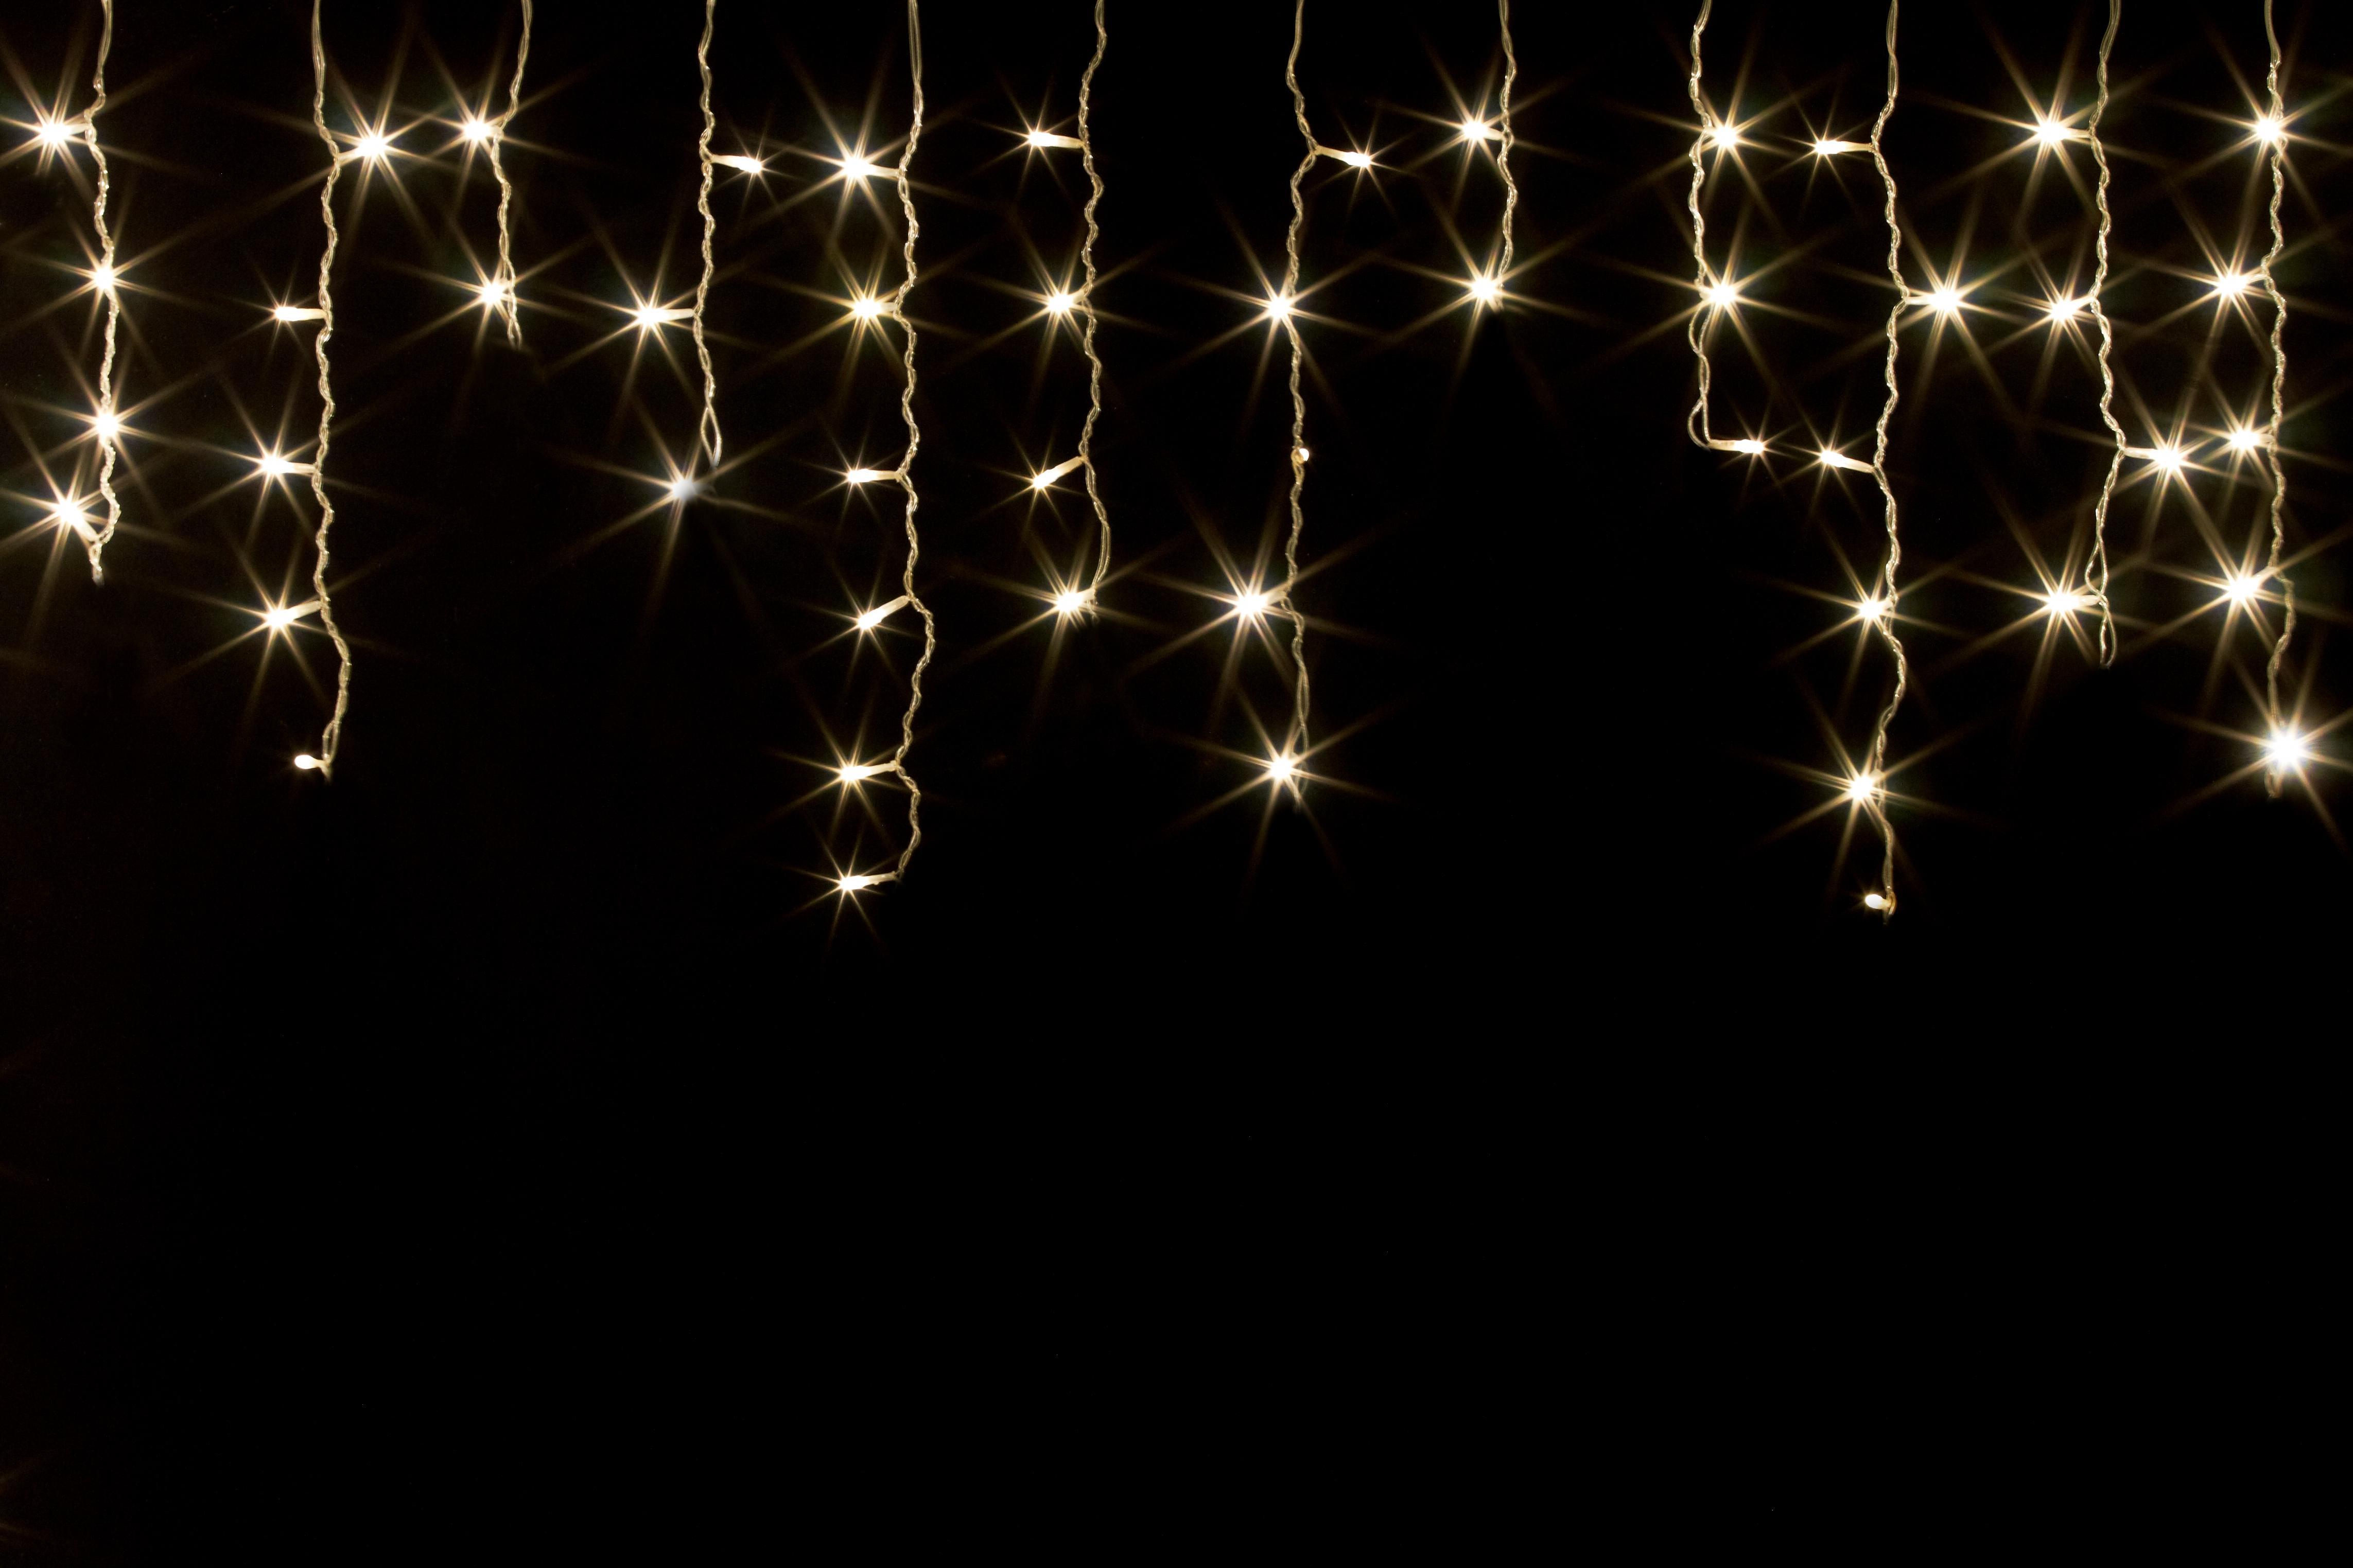 светодиодная бахрома